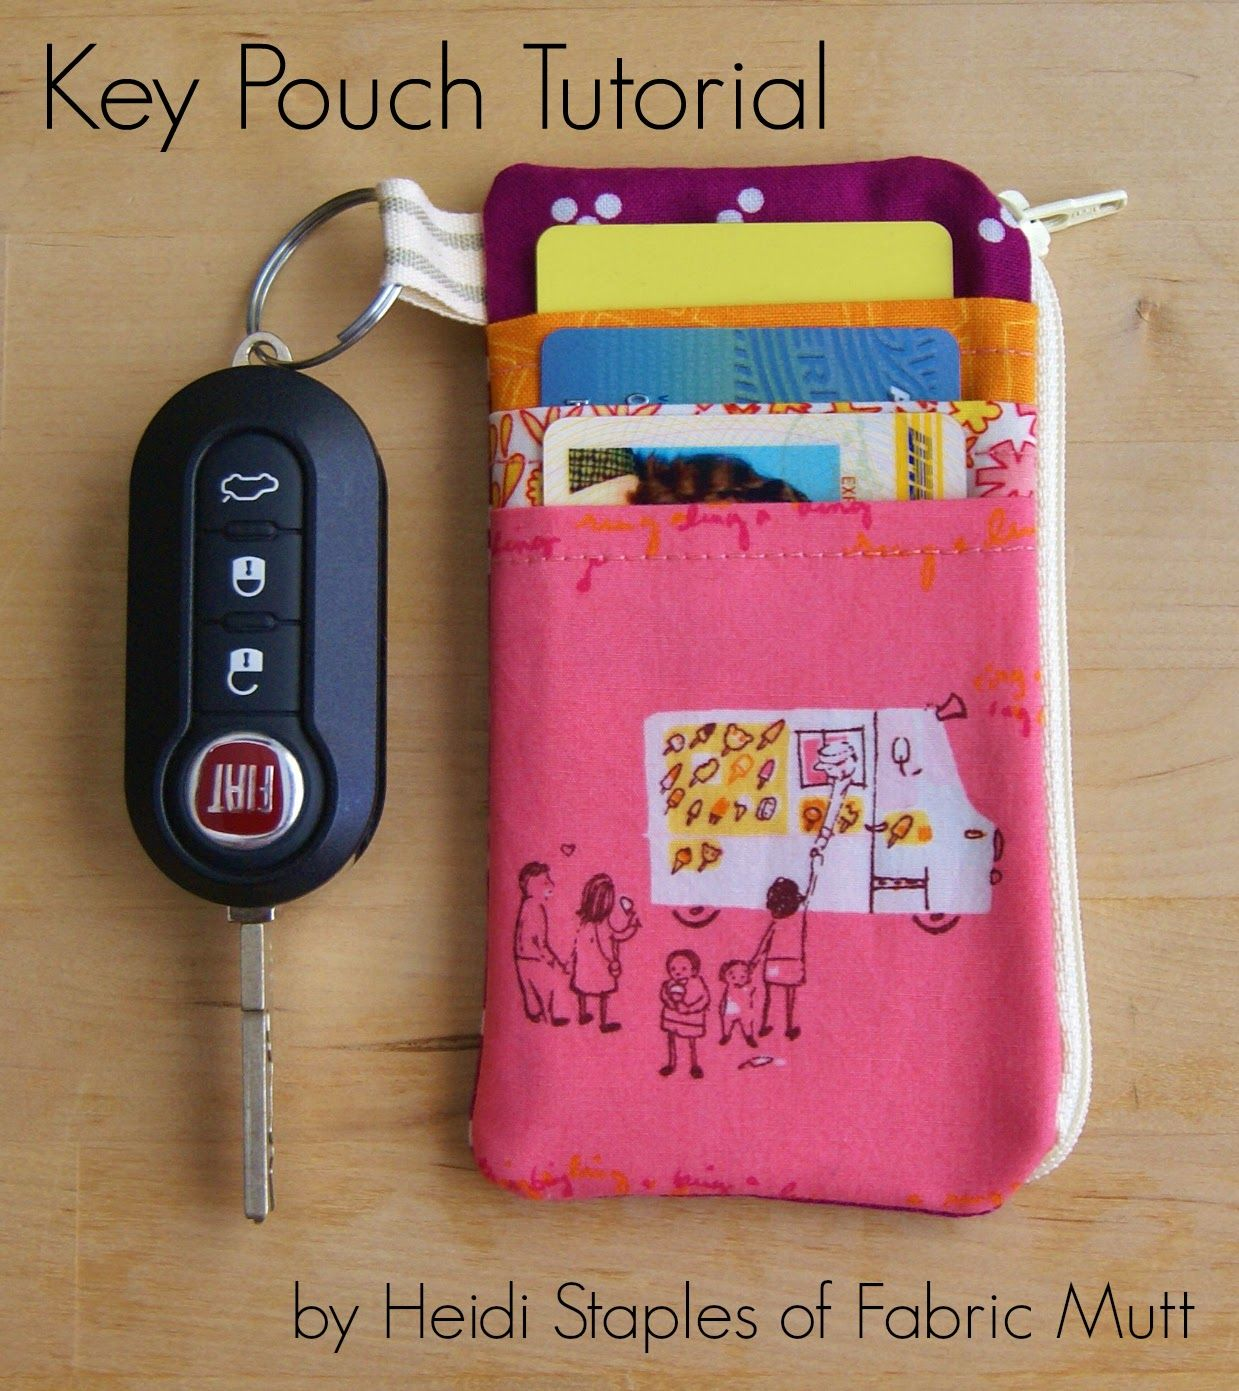 Key Pouch Tutorial